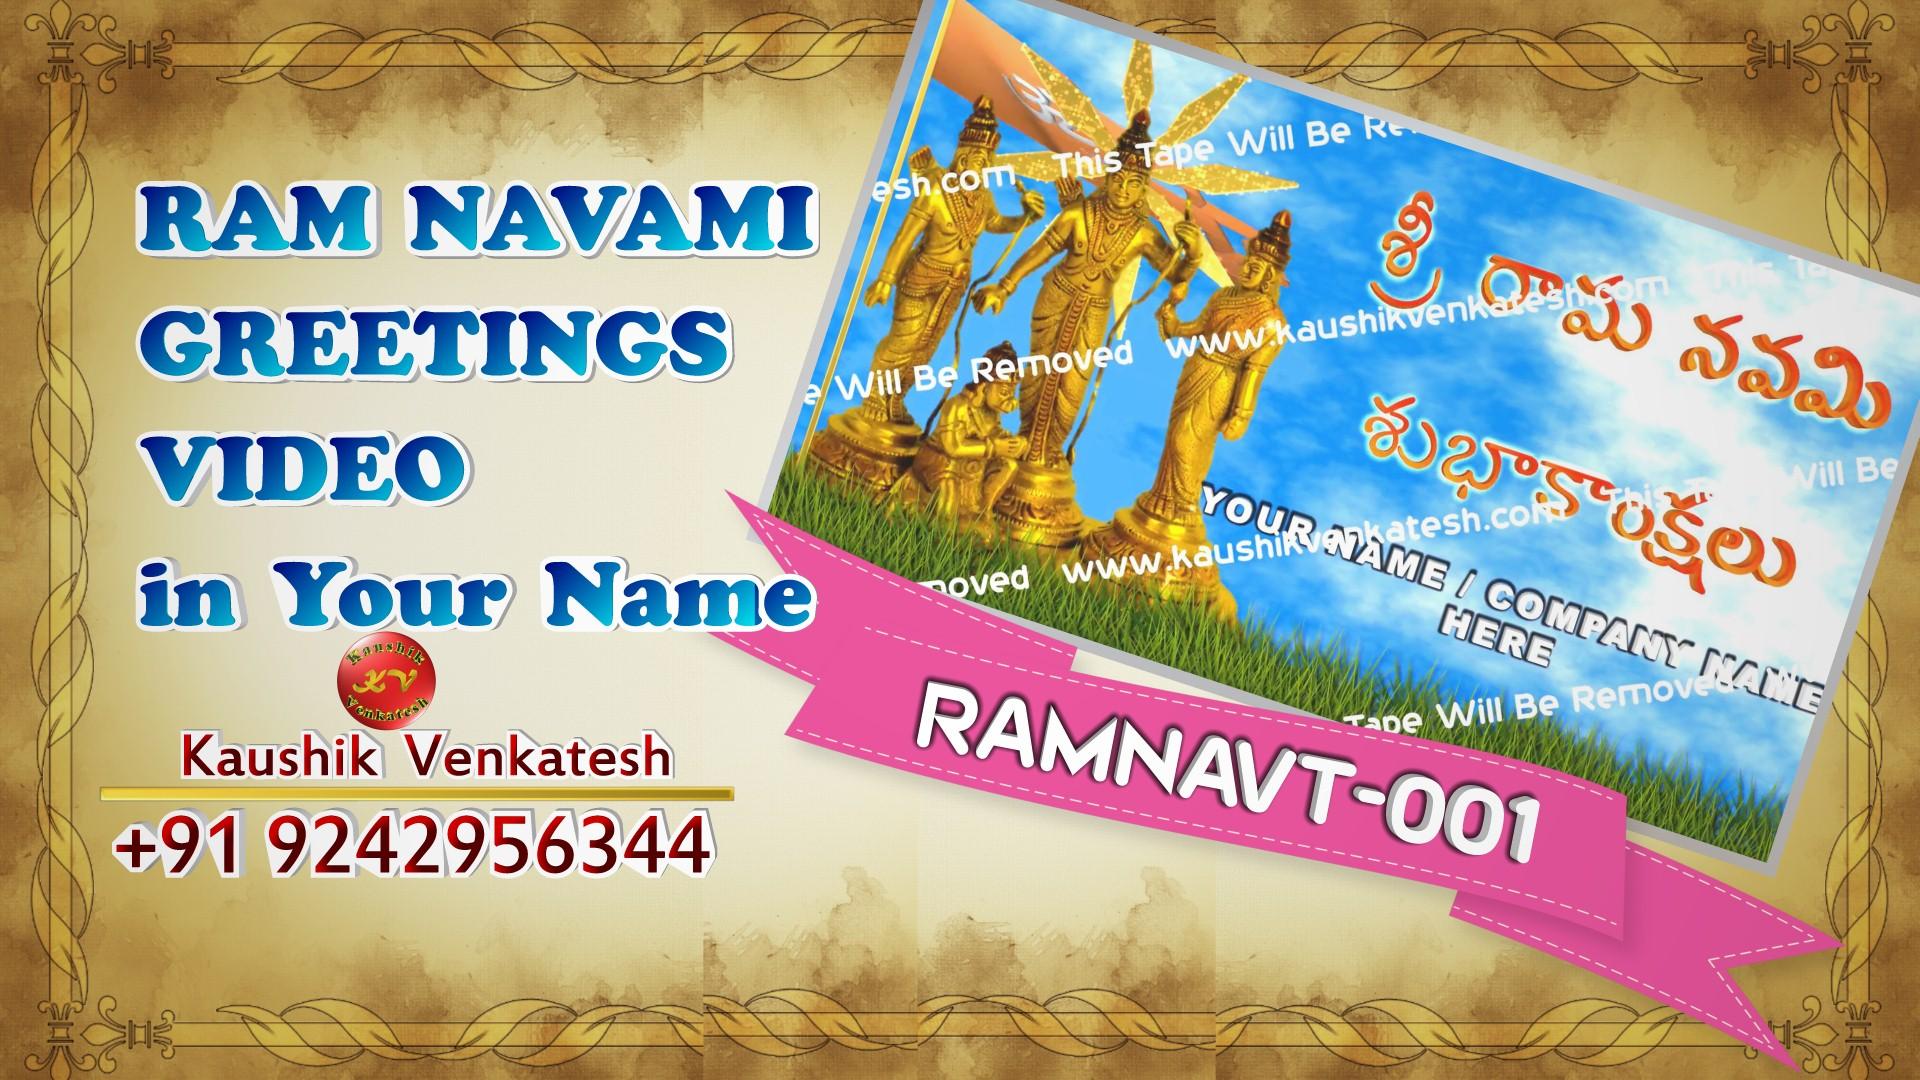 Personalized Video for Ram Navami in Telugu